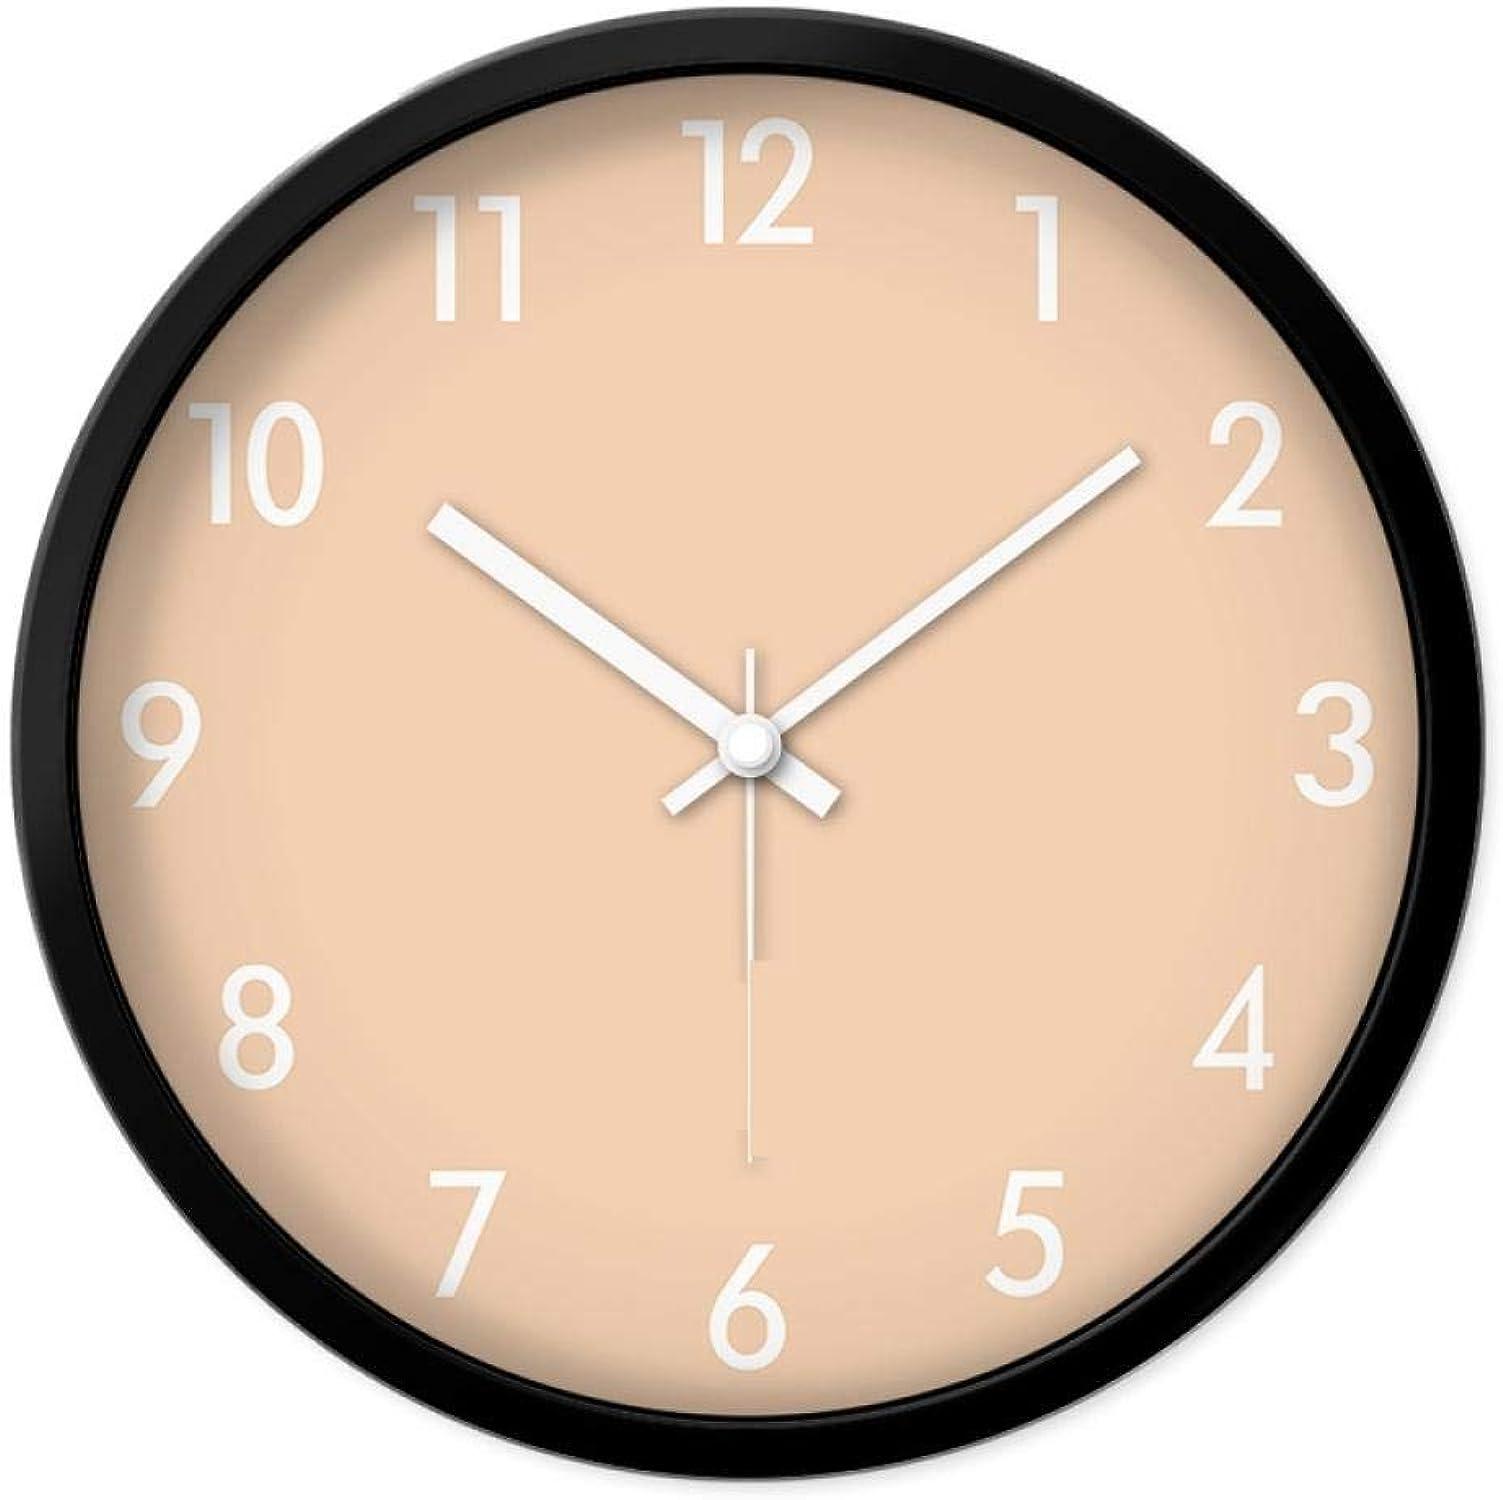 envio rapido a ti Zhtt Reloj de Parojo Simple Reloj Creativo Adecuado Adecuado Adecuado para Sala de Estar. Comedor de Cocina. Reloj de Parojo Mudo, Color Naranja Claro_14 Pulgadas (35 cm). Marco blancoo.  mejor servicio